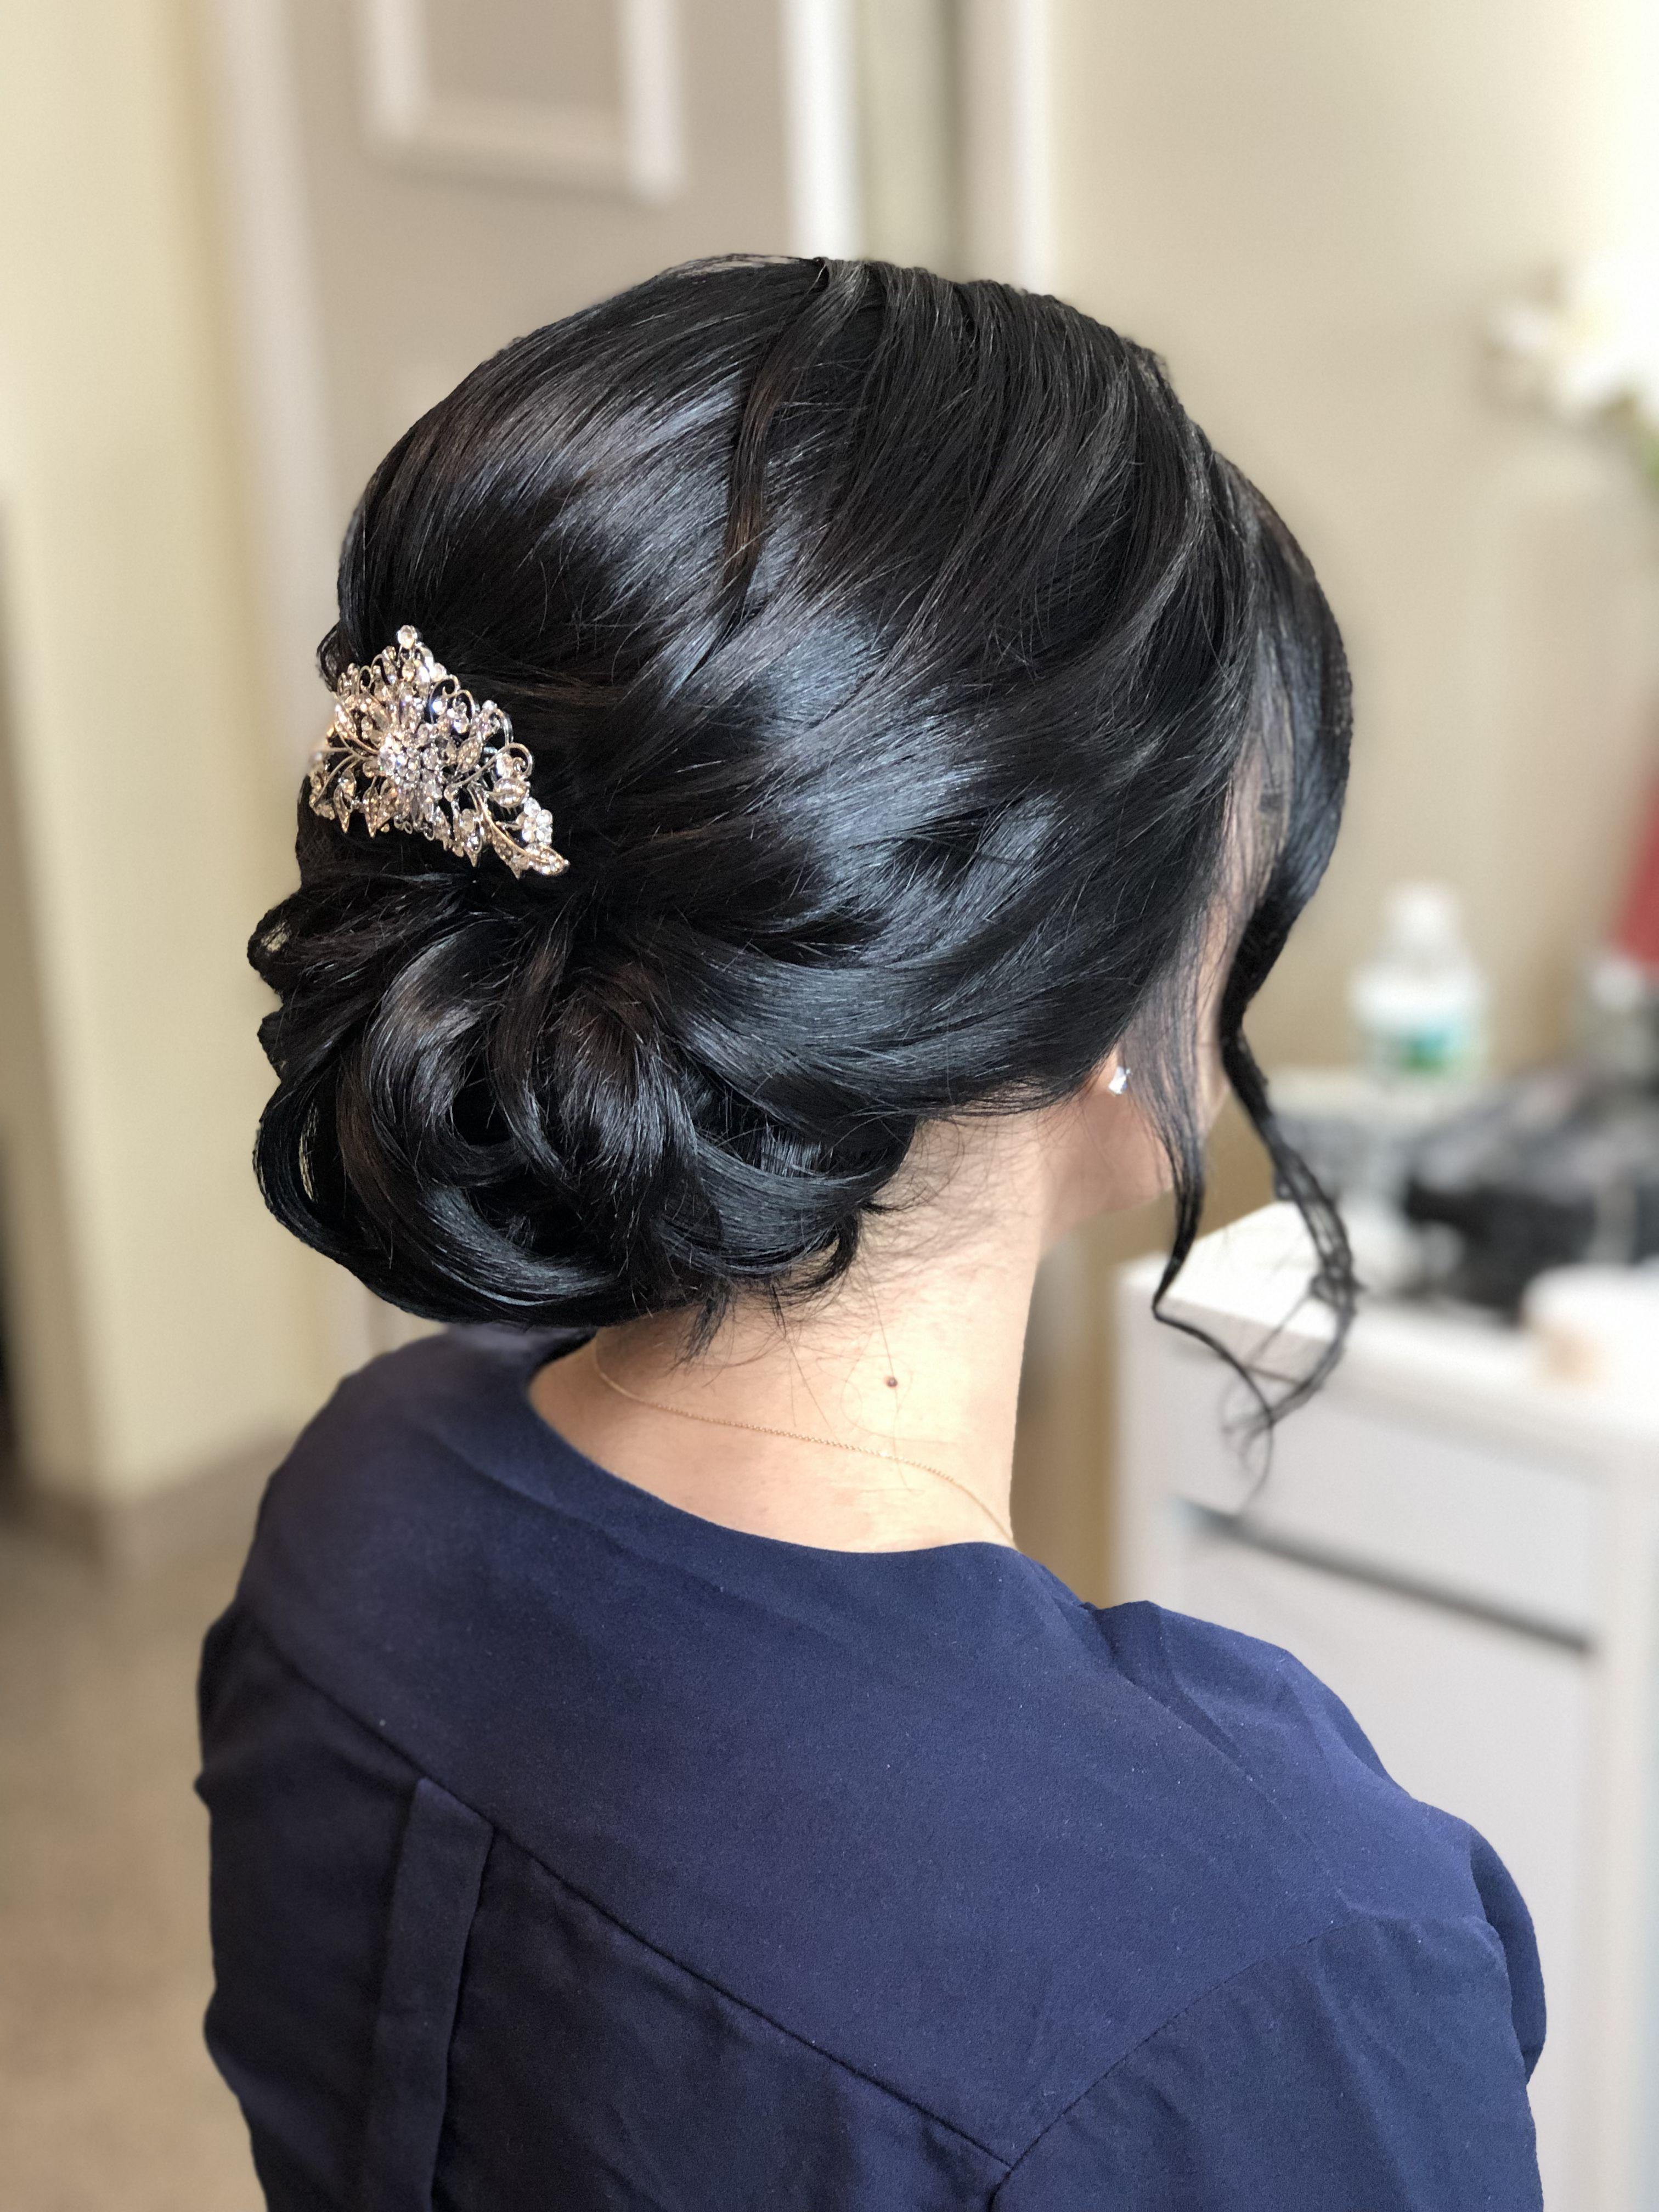 Wedding Updo, hairstyles, updos for long hair, bridesmaid ...